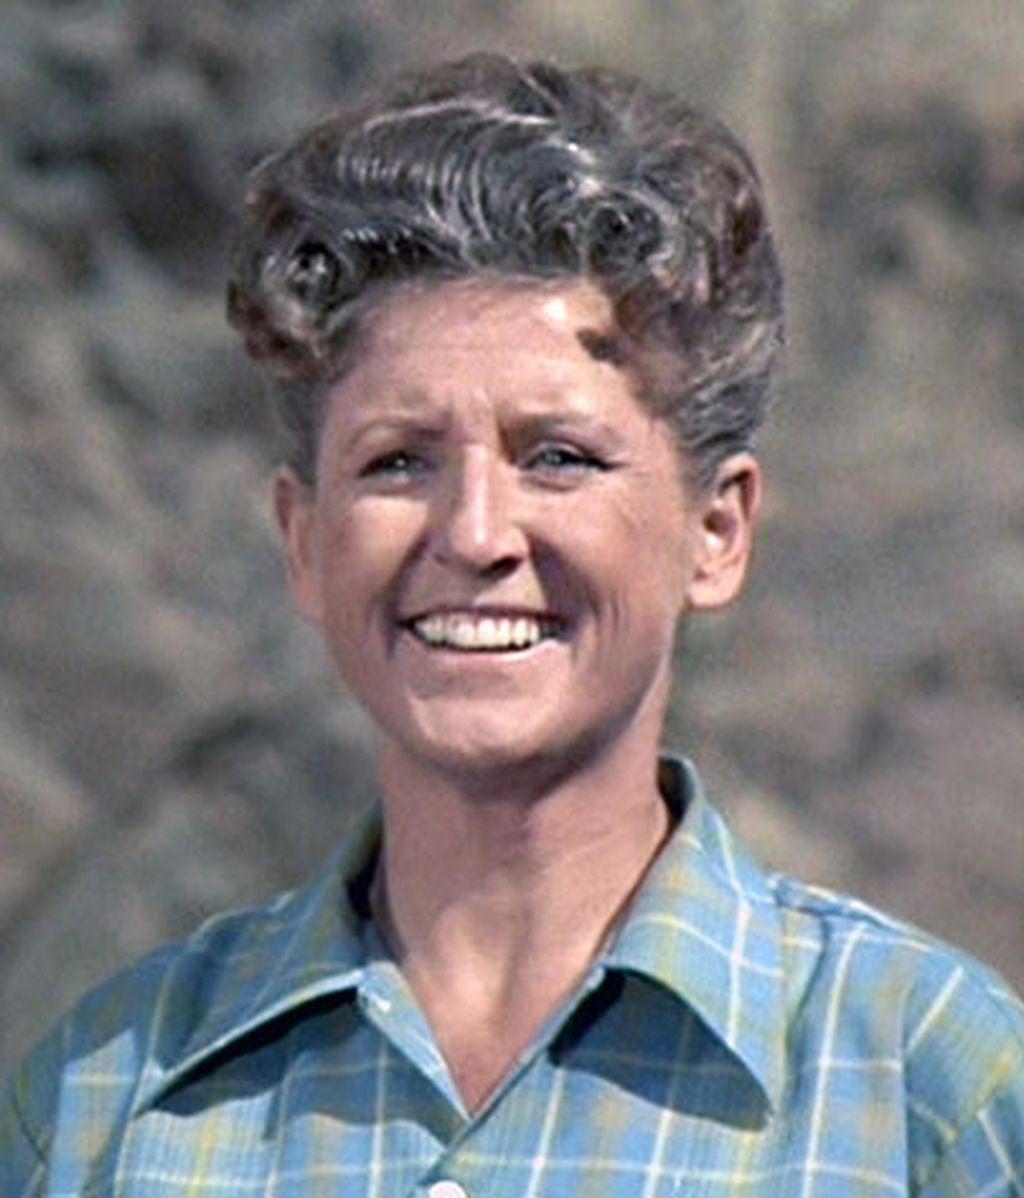 Muere Ann B. Davis, la ama de llaves de La tribu de los Brady.